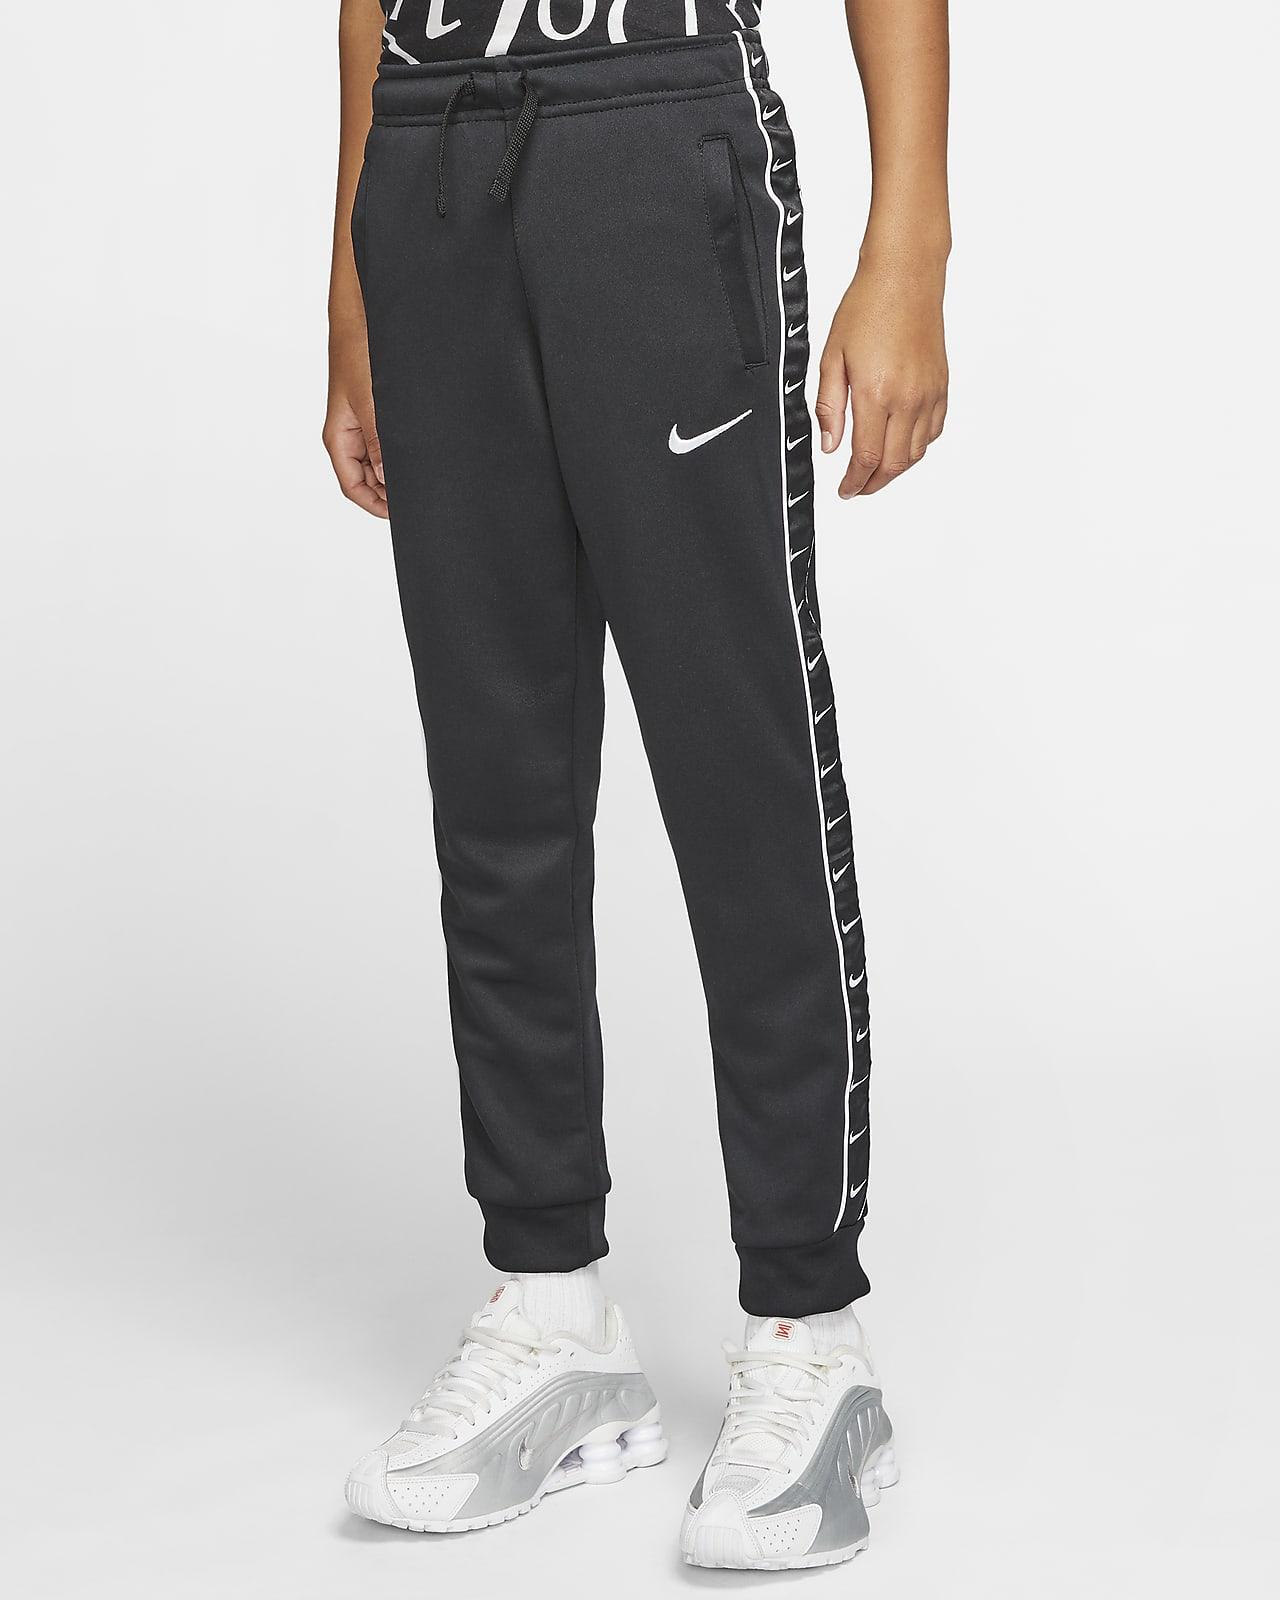 Nike Sportswear Swoosh Jogger für ältere Kinder